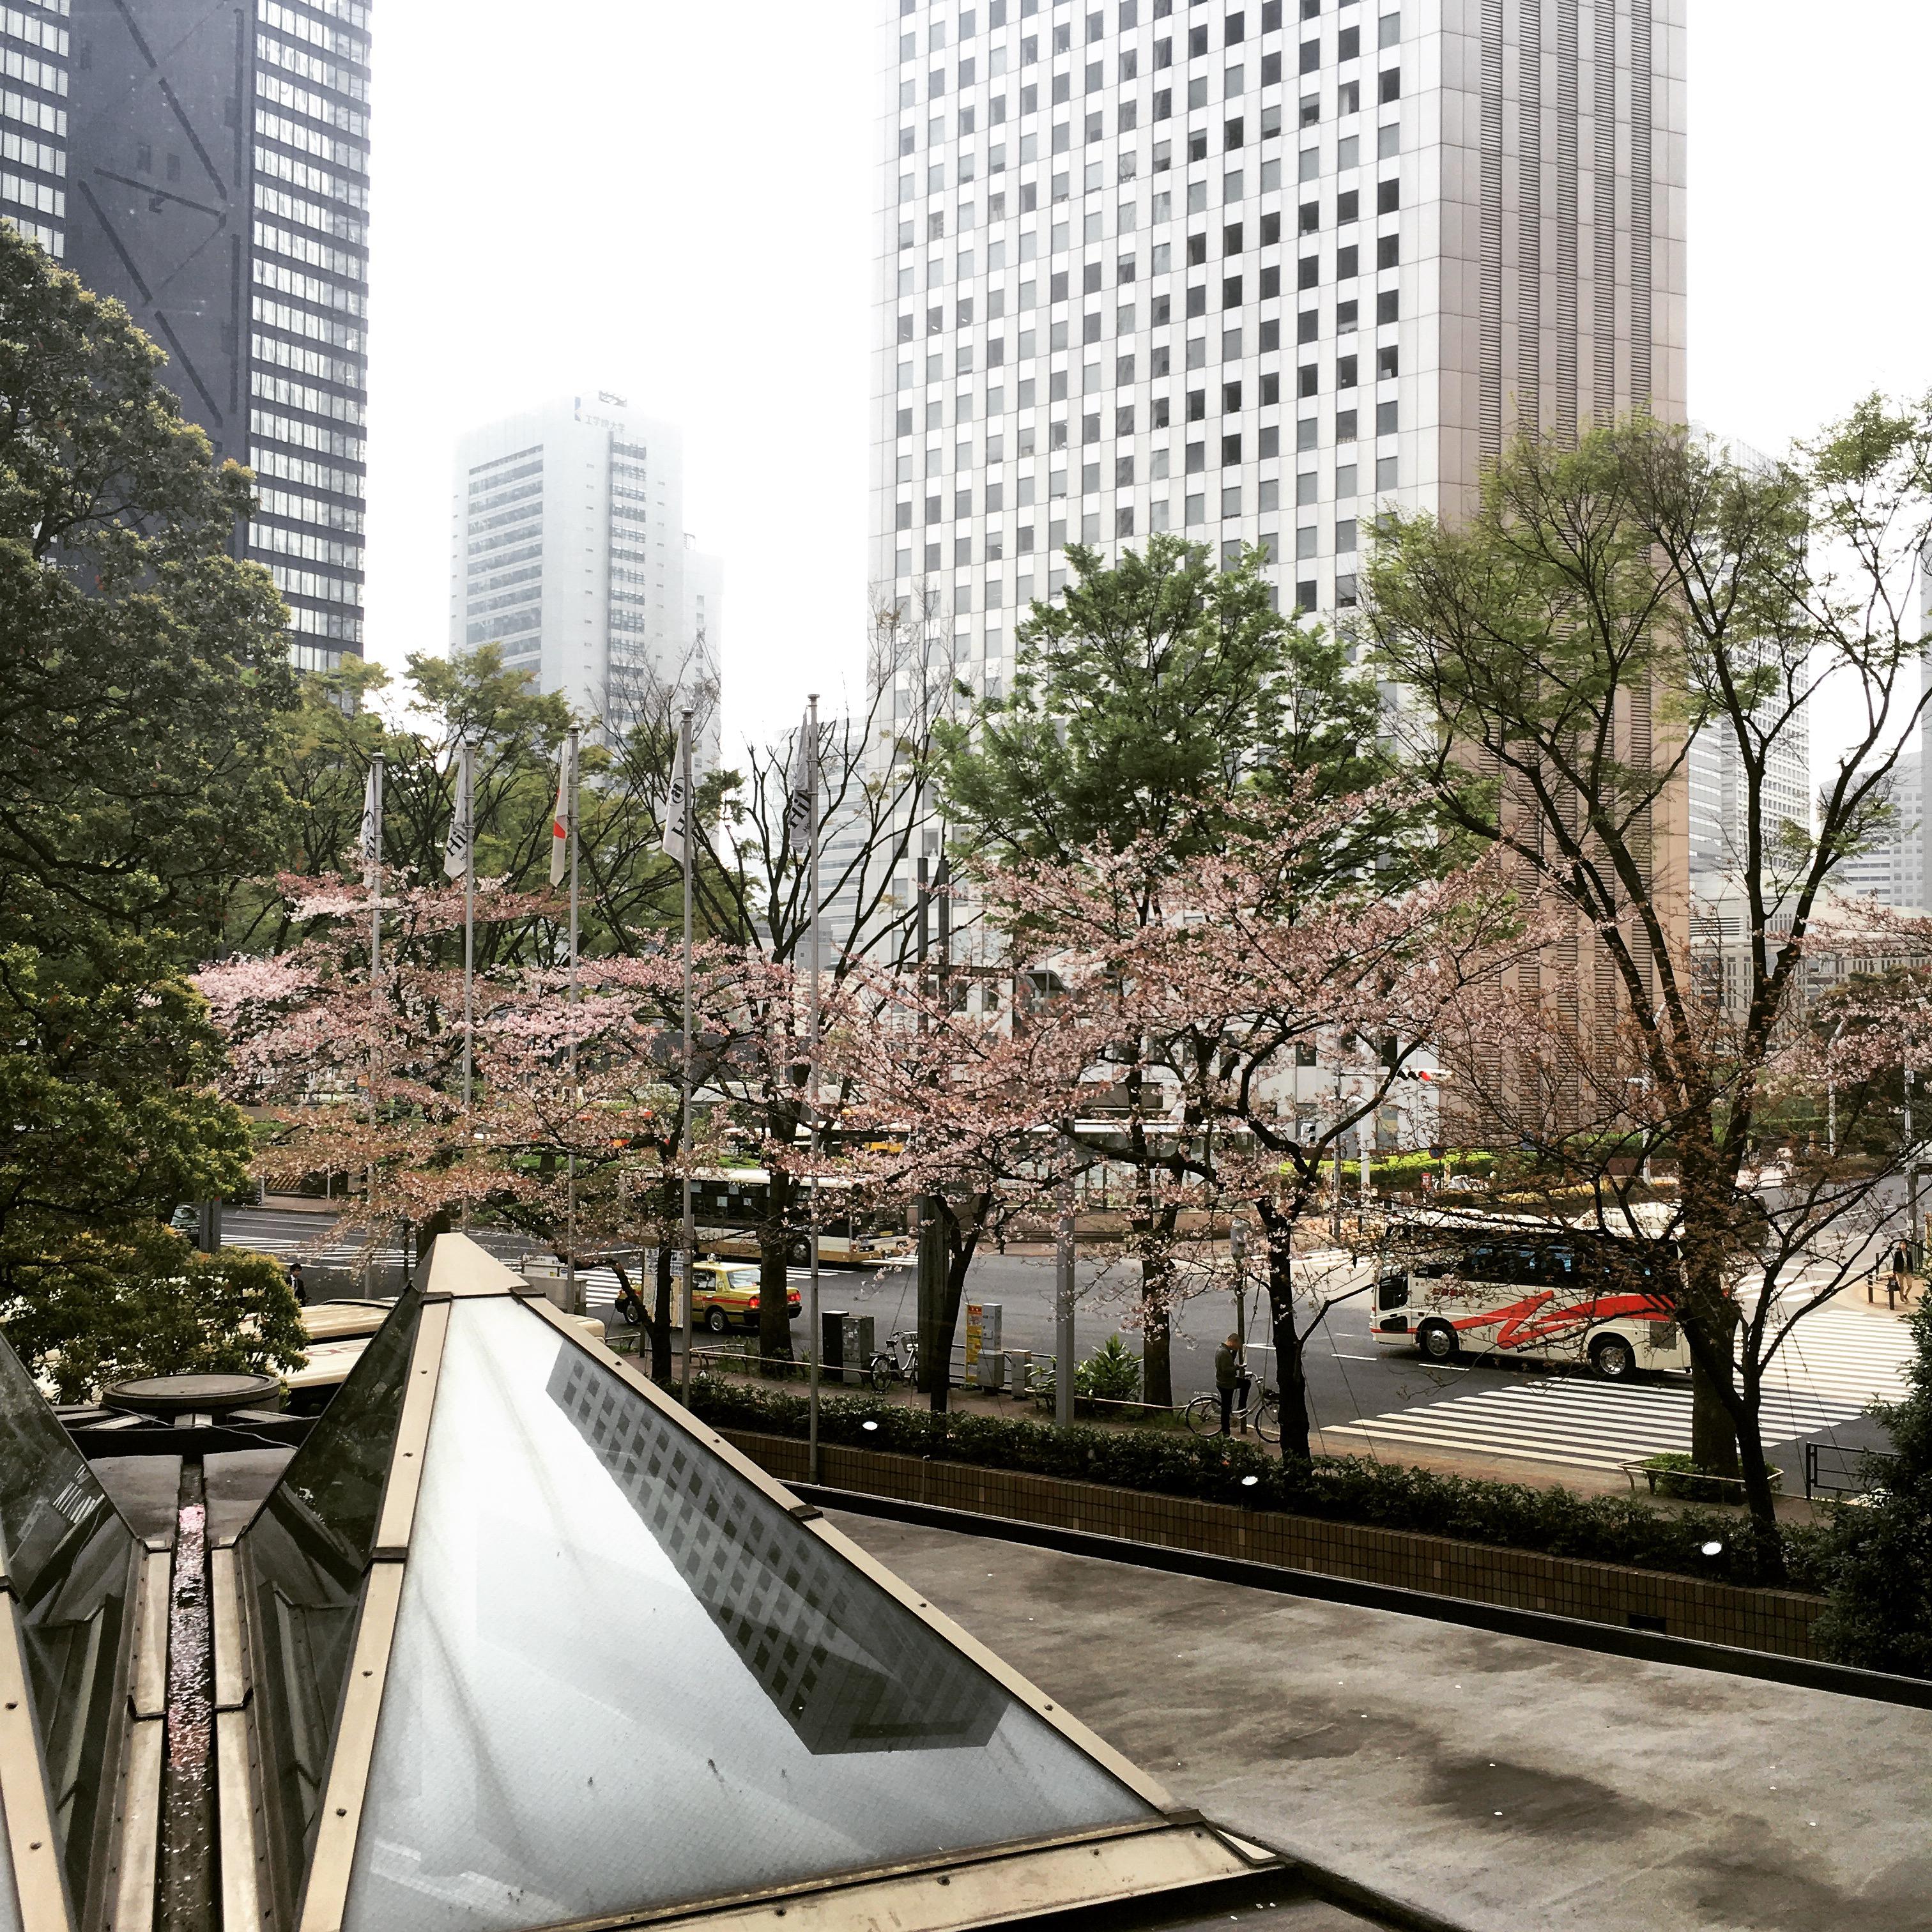 how to get to hilton odaiba from shinjuku station